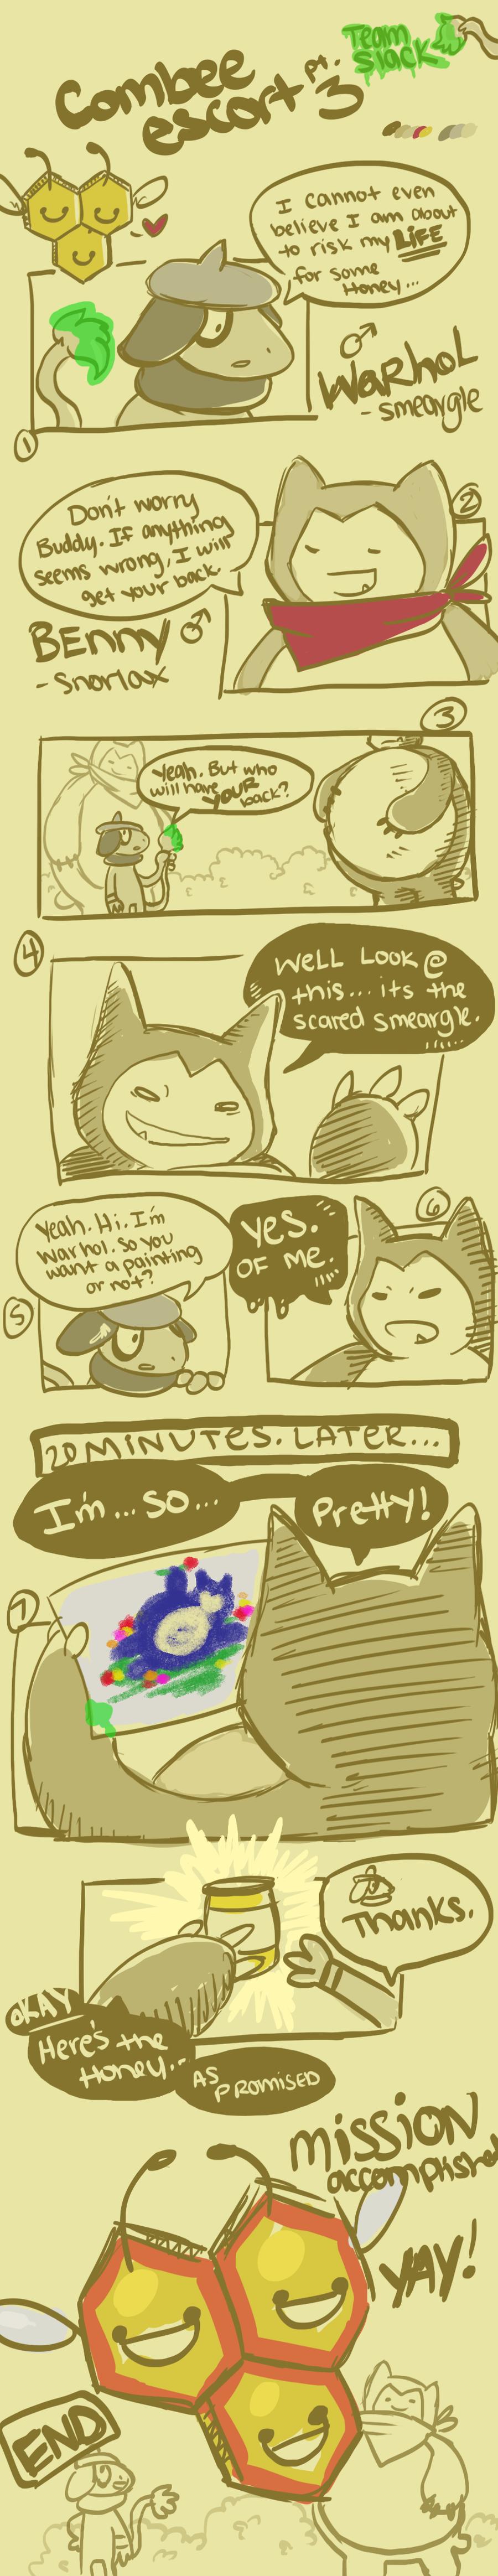 Team Slack- Combee Escort pg 3 by tabby-like-a-cat